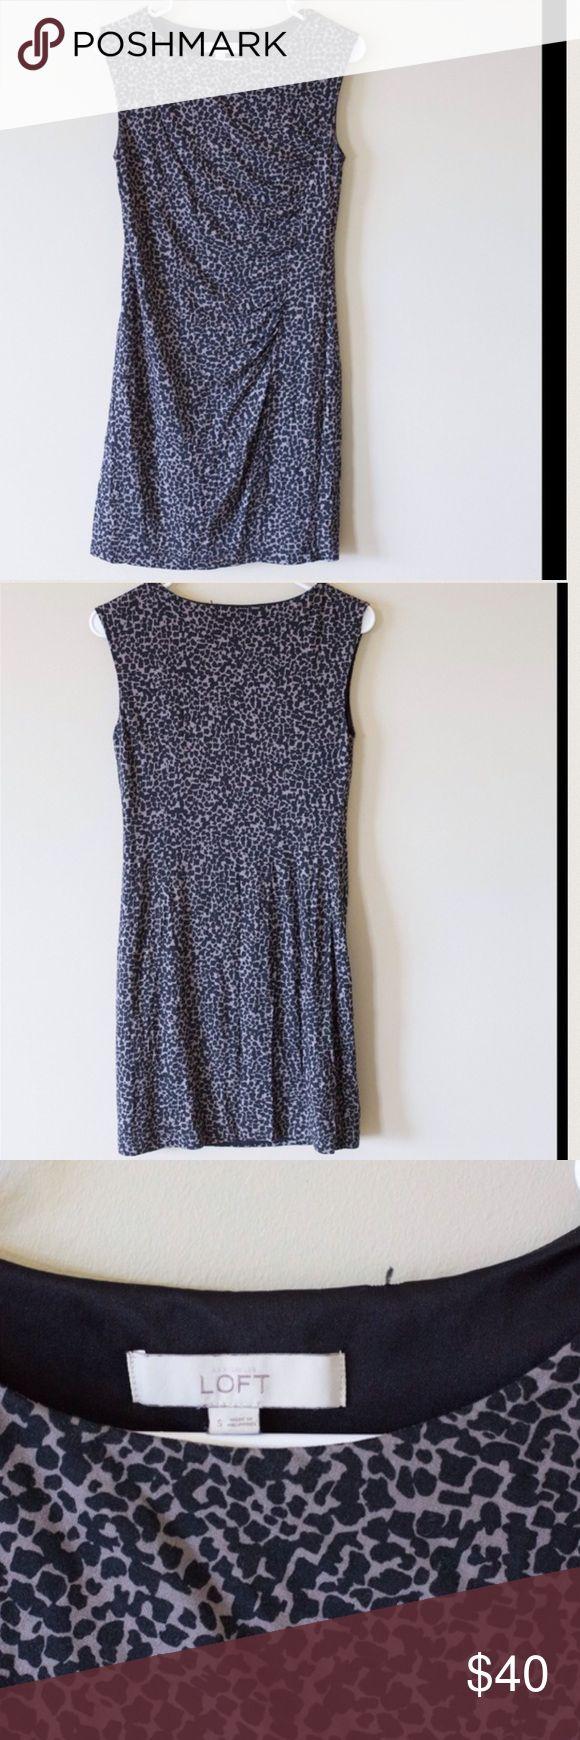 Loft cheetah print dress with tank top straps LOFT cheetah print side cinch dress. No damage, body 70% rayon shell 100% polyester LOFT Dresses